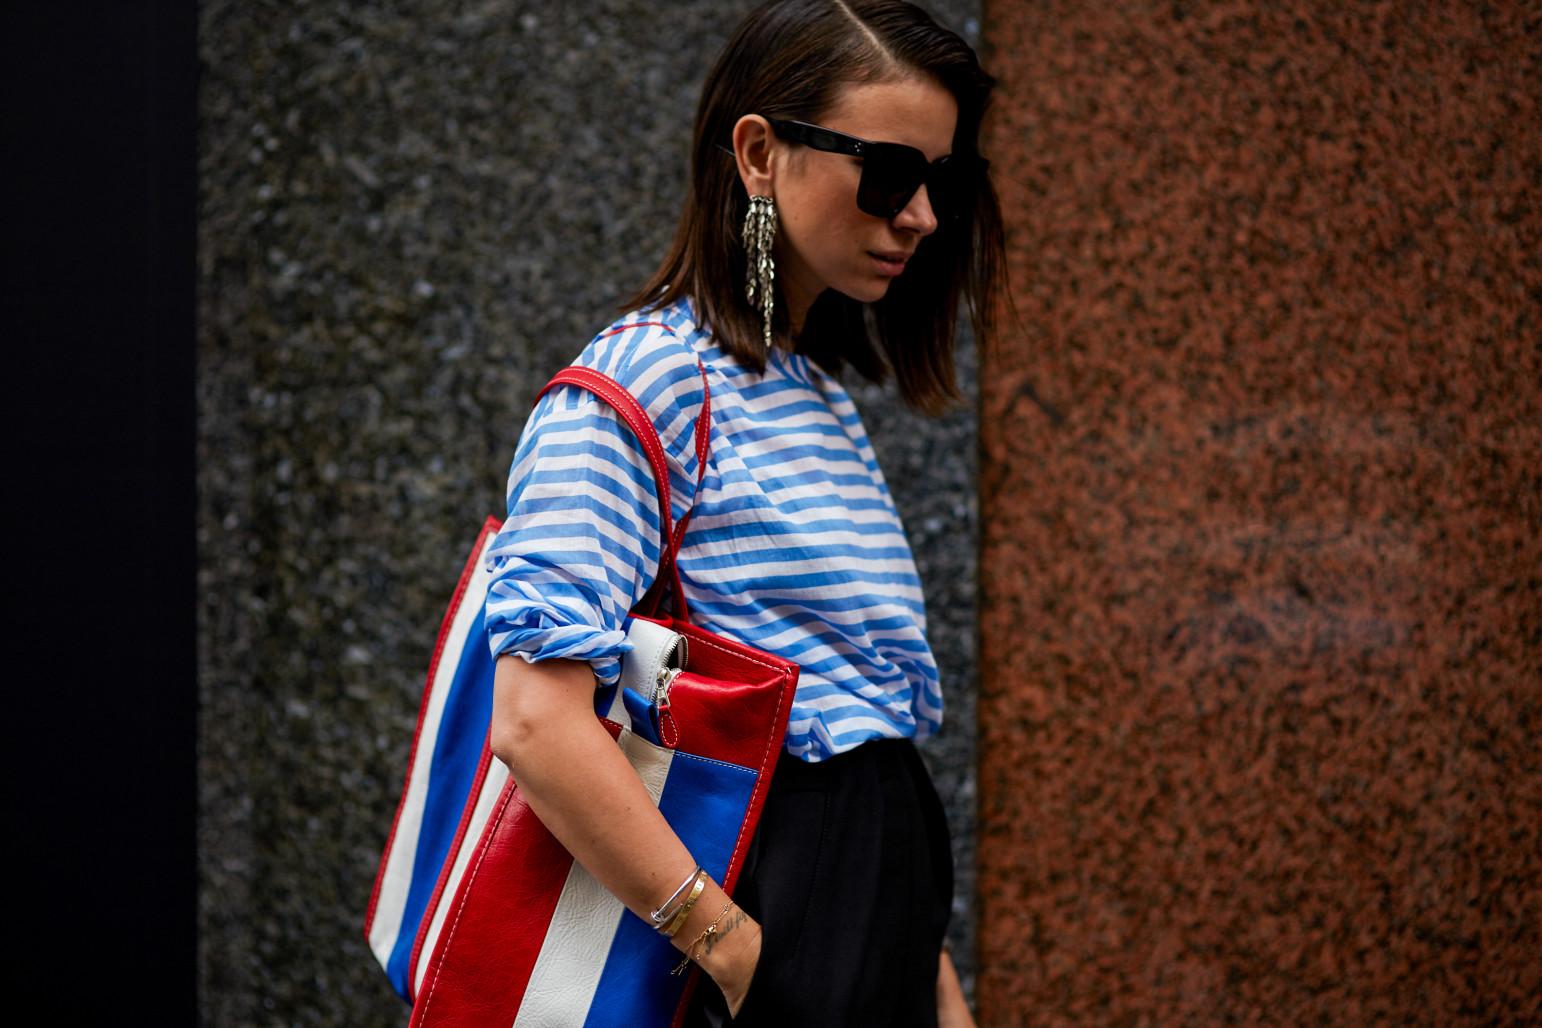 ShotByGio-George-Angelis-Paris-Haute-Couture-Fashion-Week-Fall-2016-5825-1542x1028.jpg